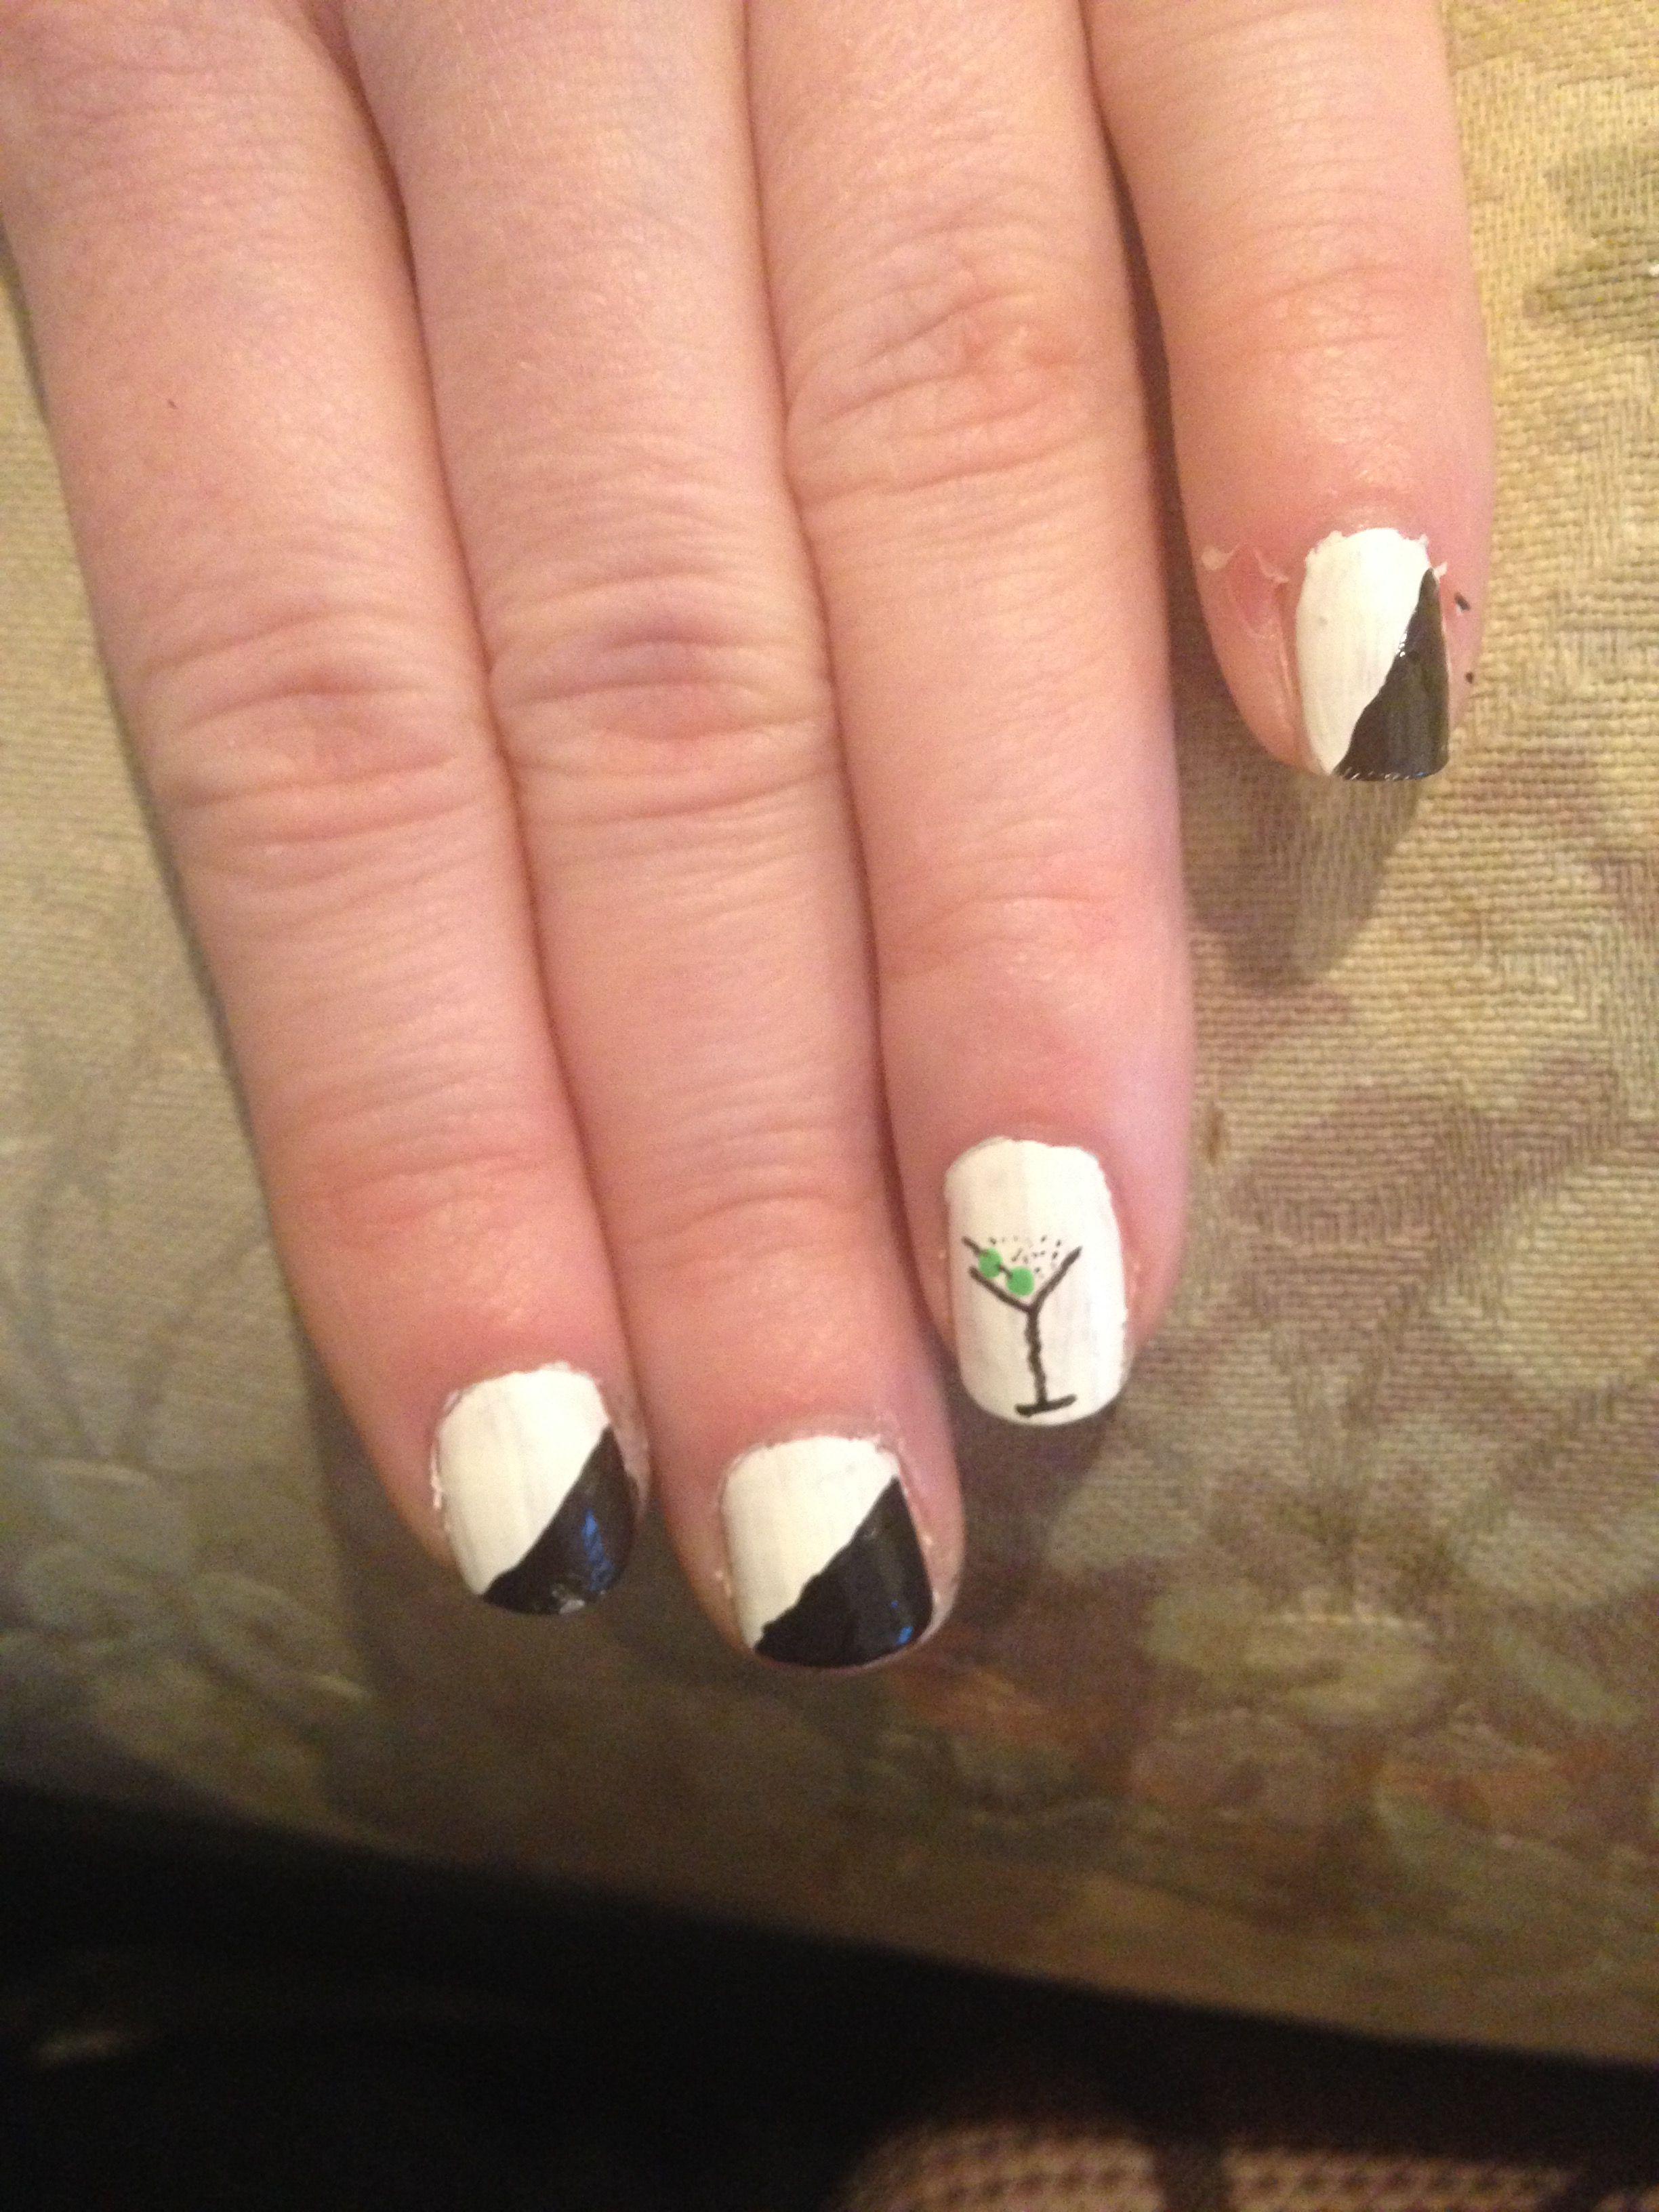 James Bond, cocktail, nail art   My short nails art!   Pinterest ...